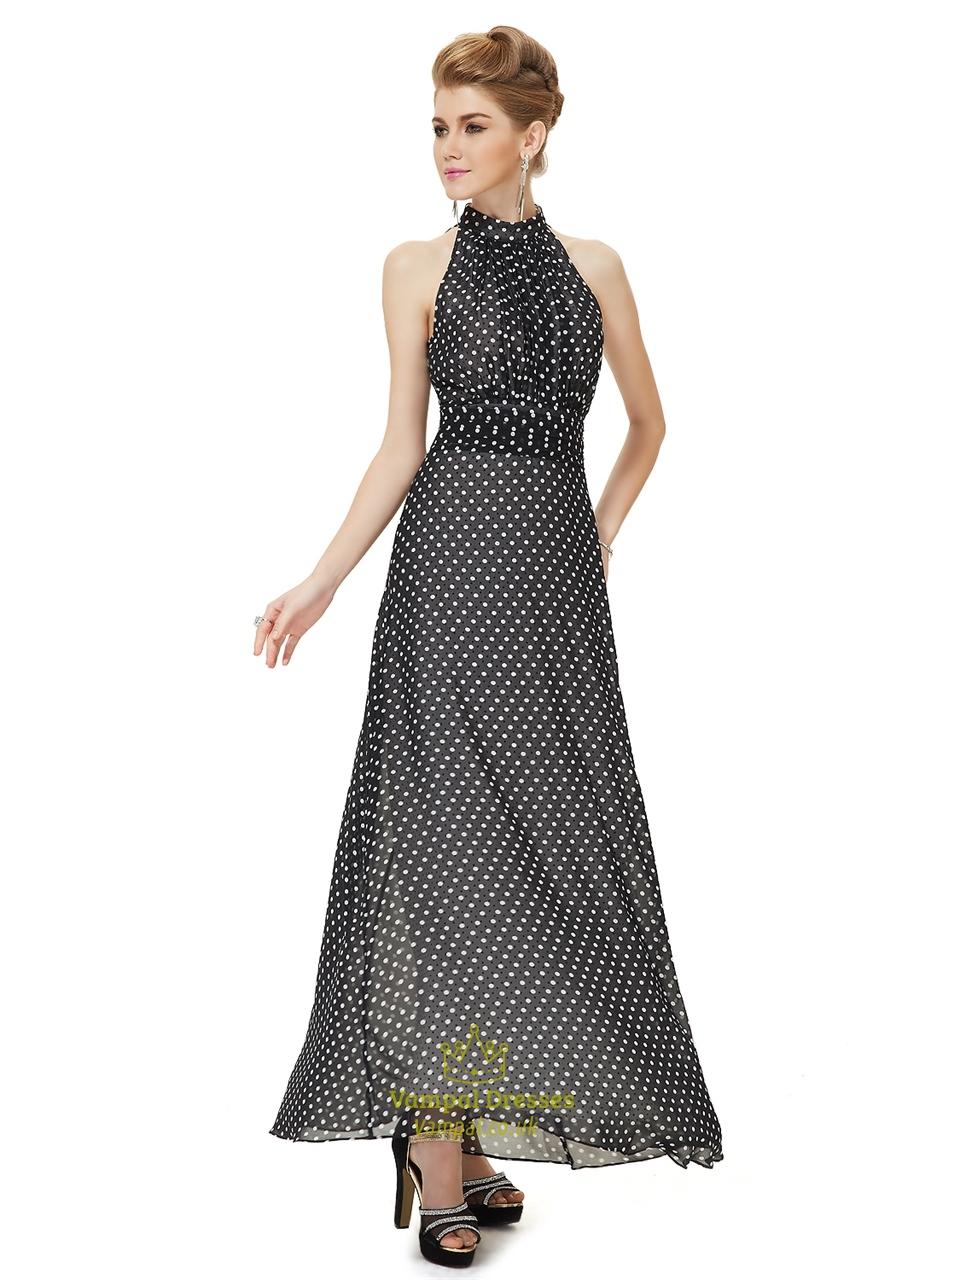 dd2ec3e5bf5c Women S Casual Black And White High Neck Long Polka Dot Summer Dress SKU  -NW1317